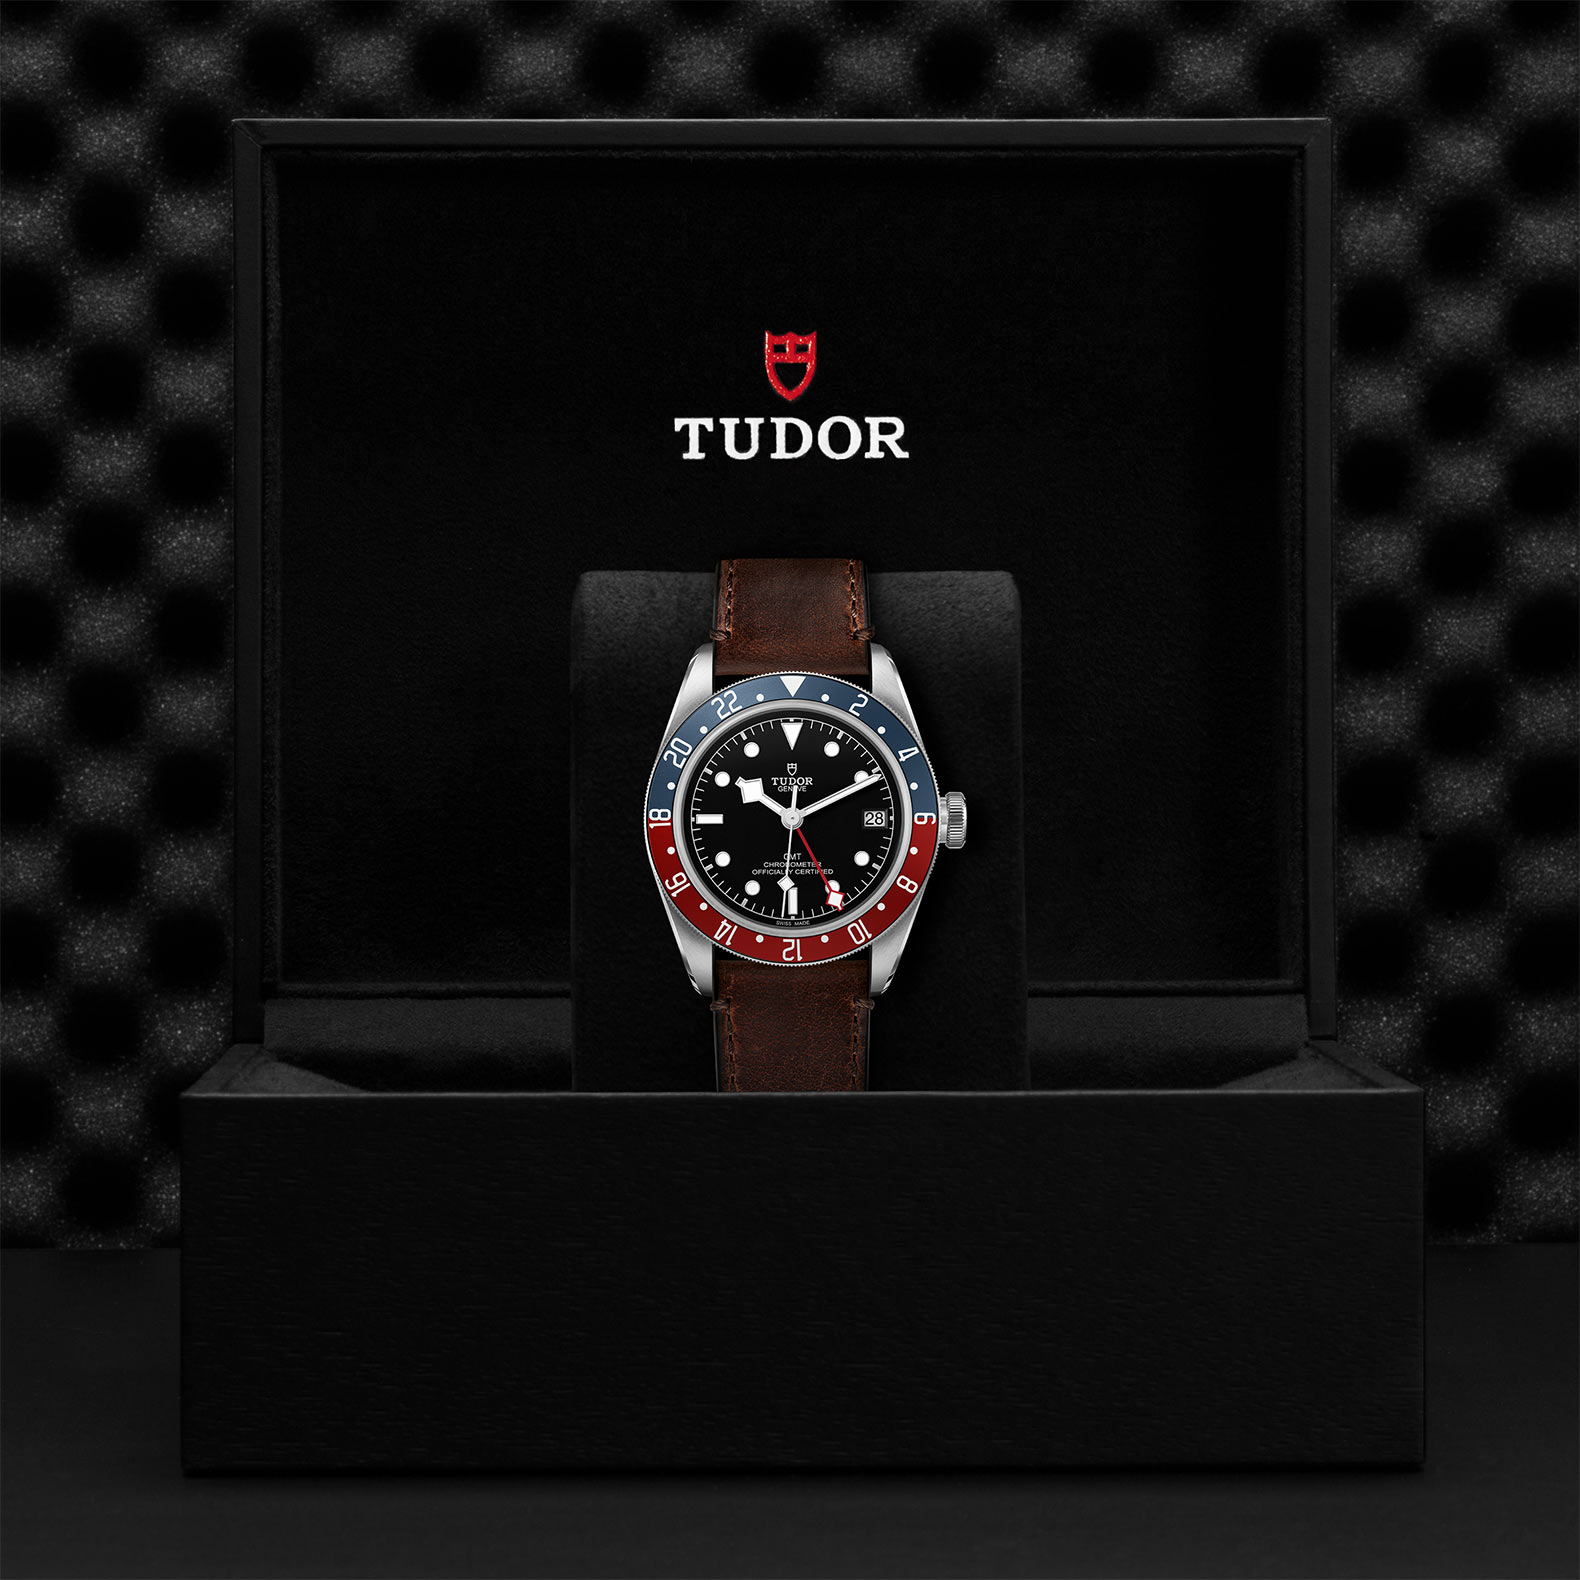 TUDOR Black Bay GMT M79830RB 0002 Presentation